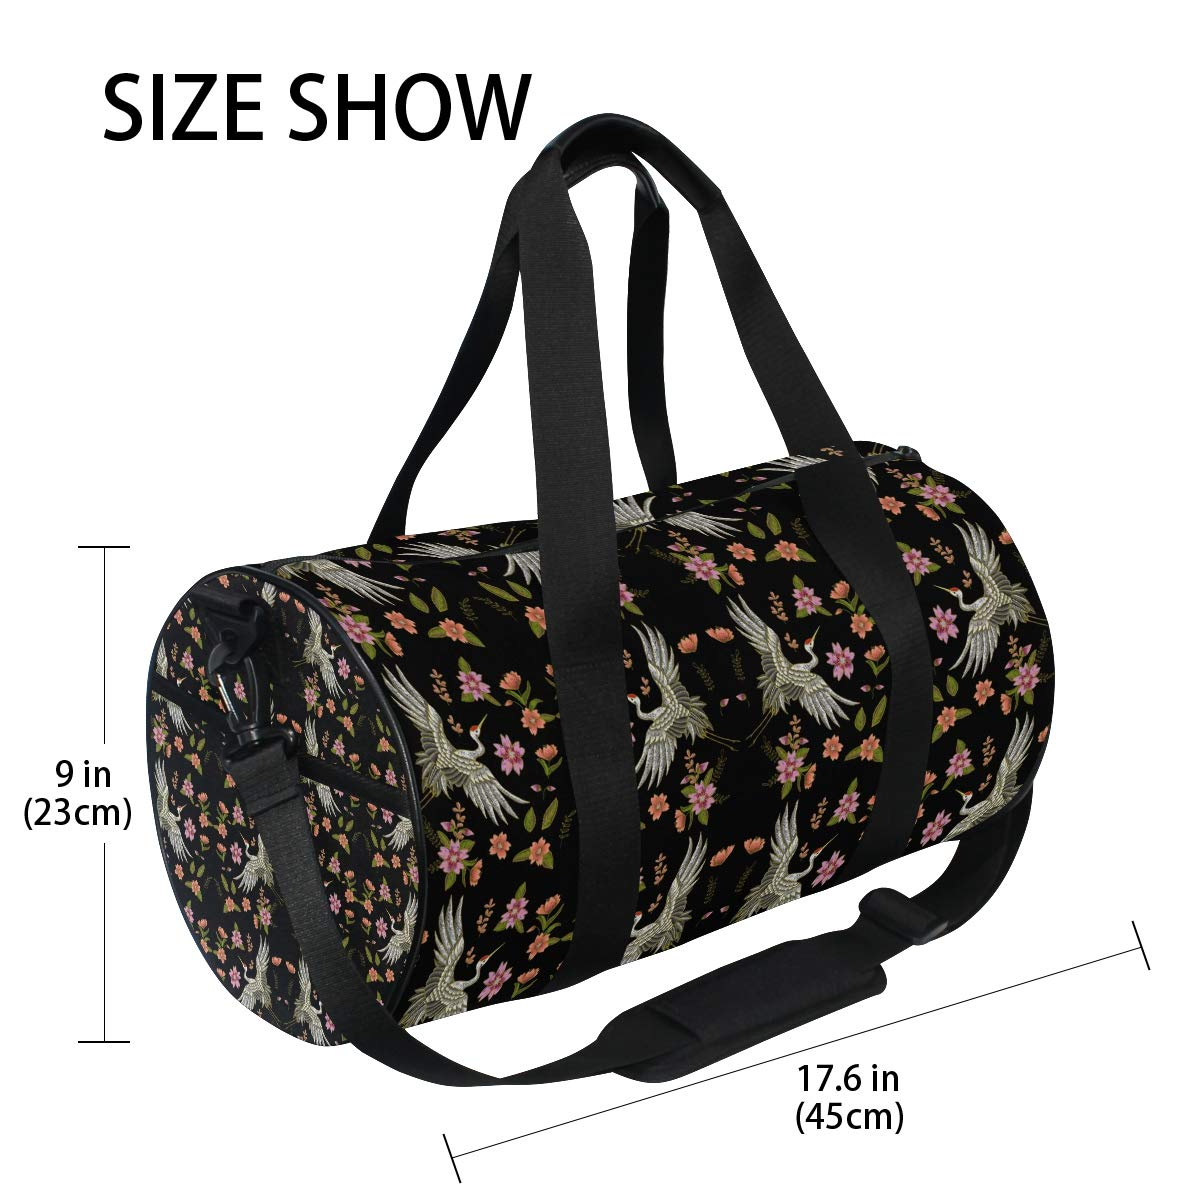 Sports Gym Duffel Barrel Bag Japanese Crane Flowers Travel Luggage Handbag for Men Women